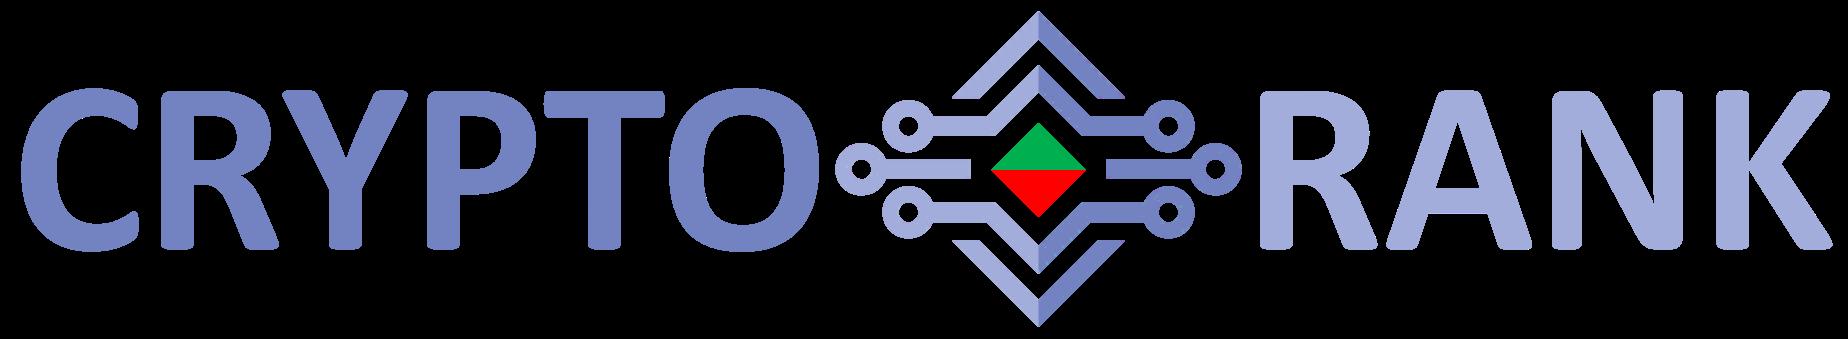 https://www.cryptorank.online/assets/frontend/cryptorank_logo.png